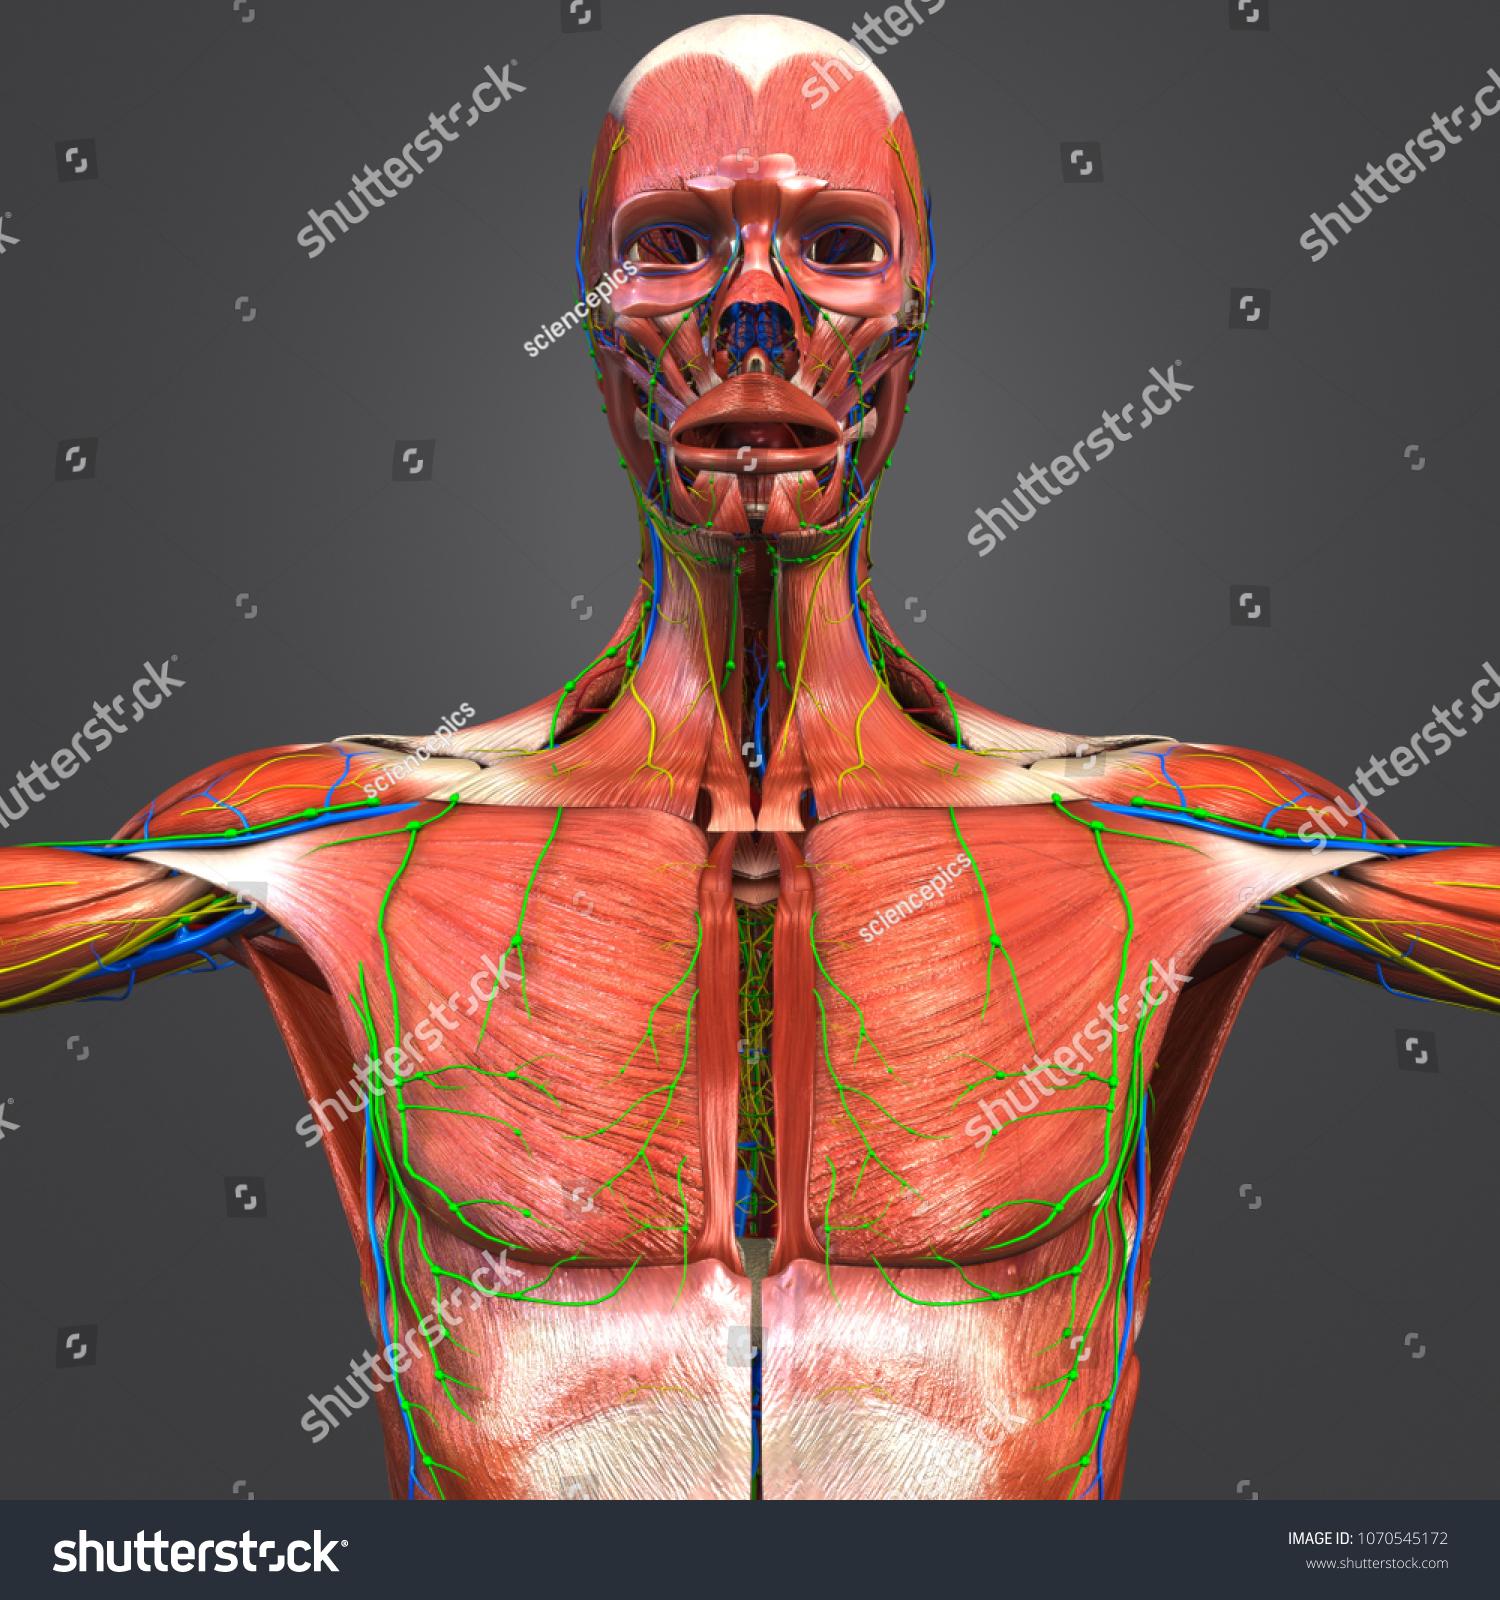 Human Muscular Anatomy Arteries Veins Nerves Stock Illustration